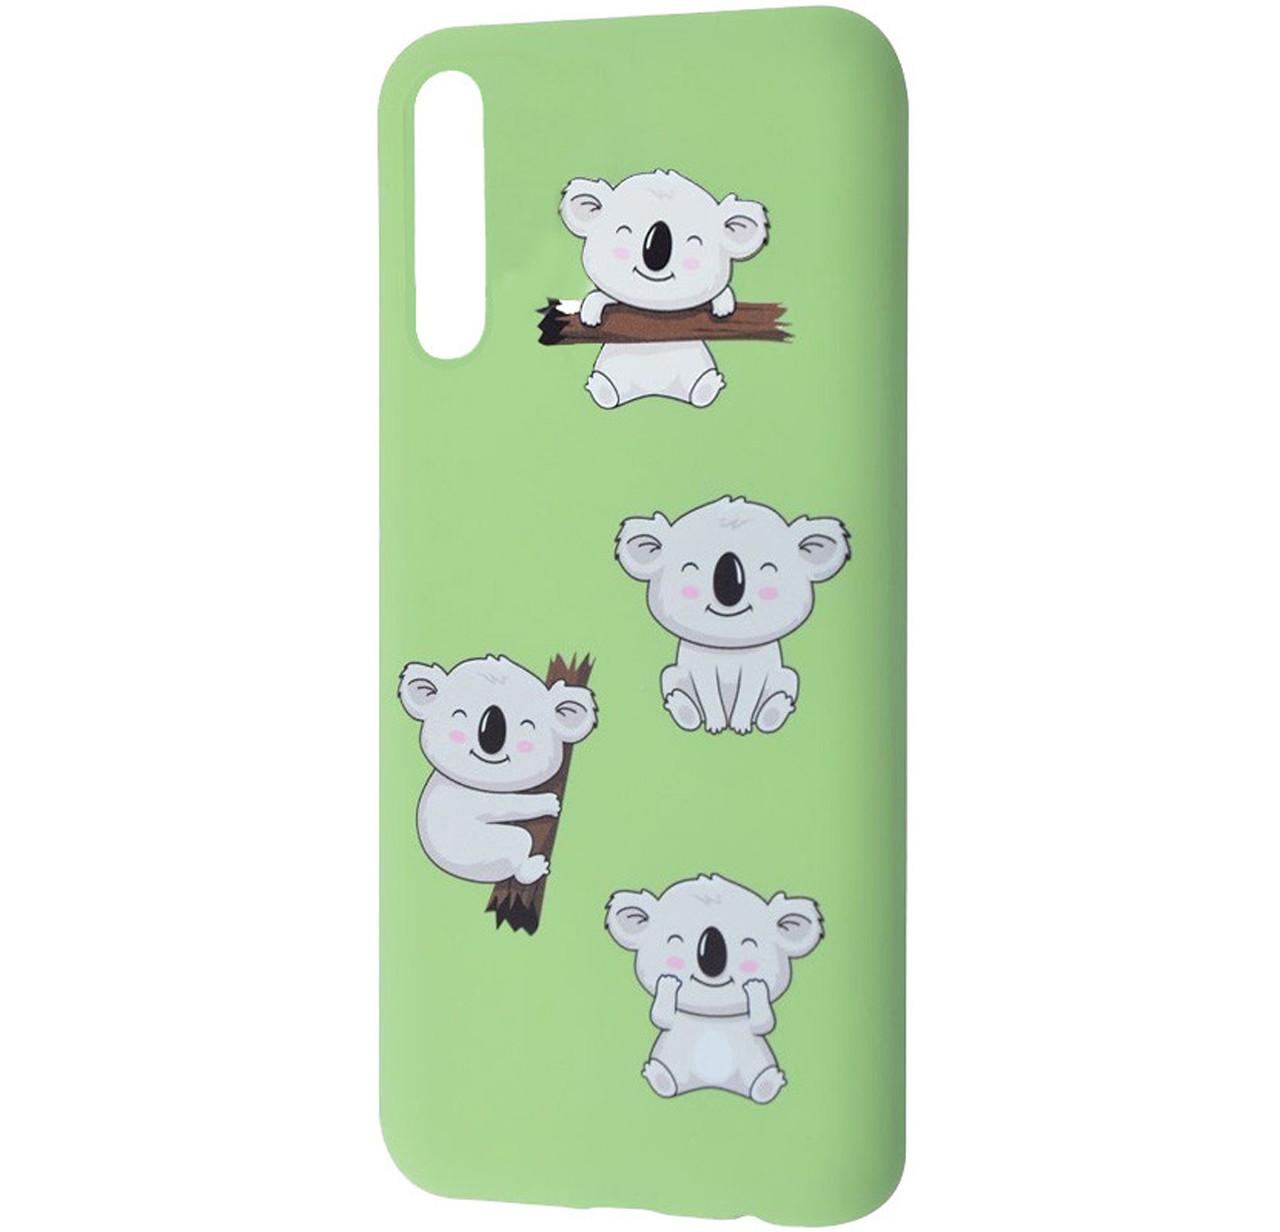 Чехол-накладка TPU WAVE Fancy Case для Samsung Galaxy A50 (2019) SM-A505F Mint Gum (Koala)